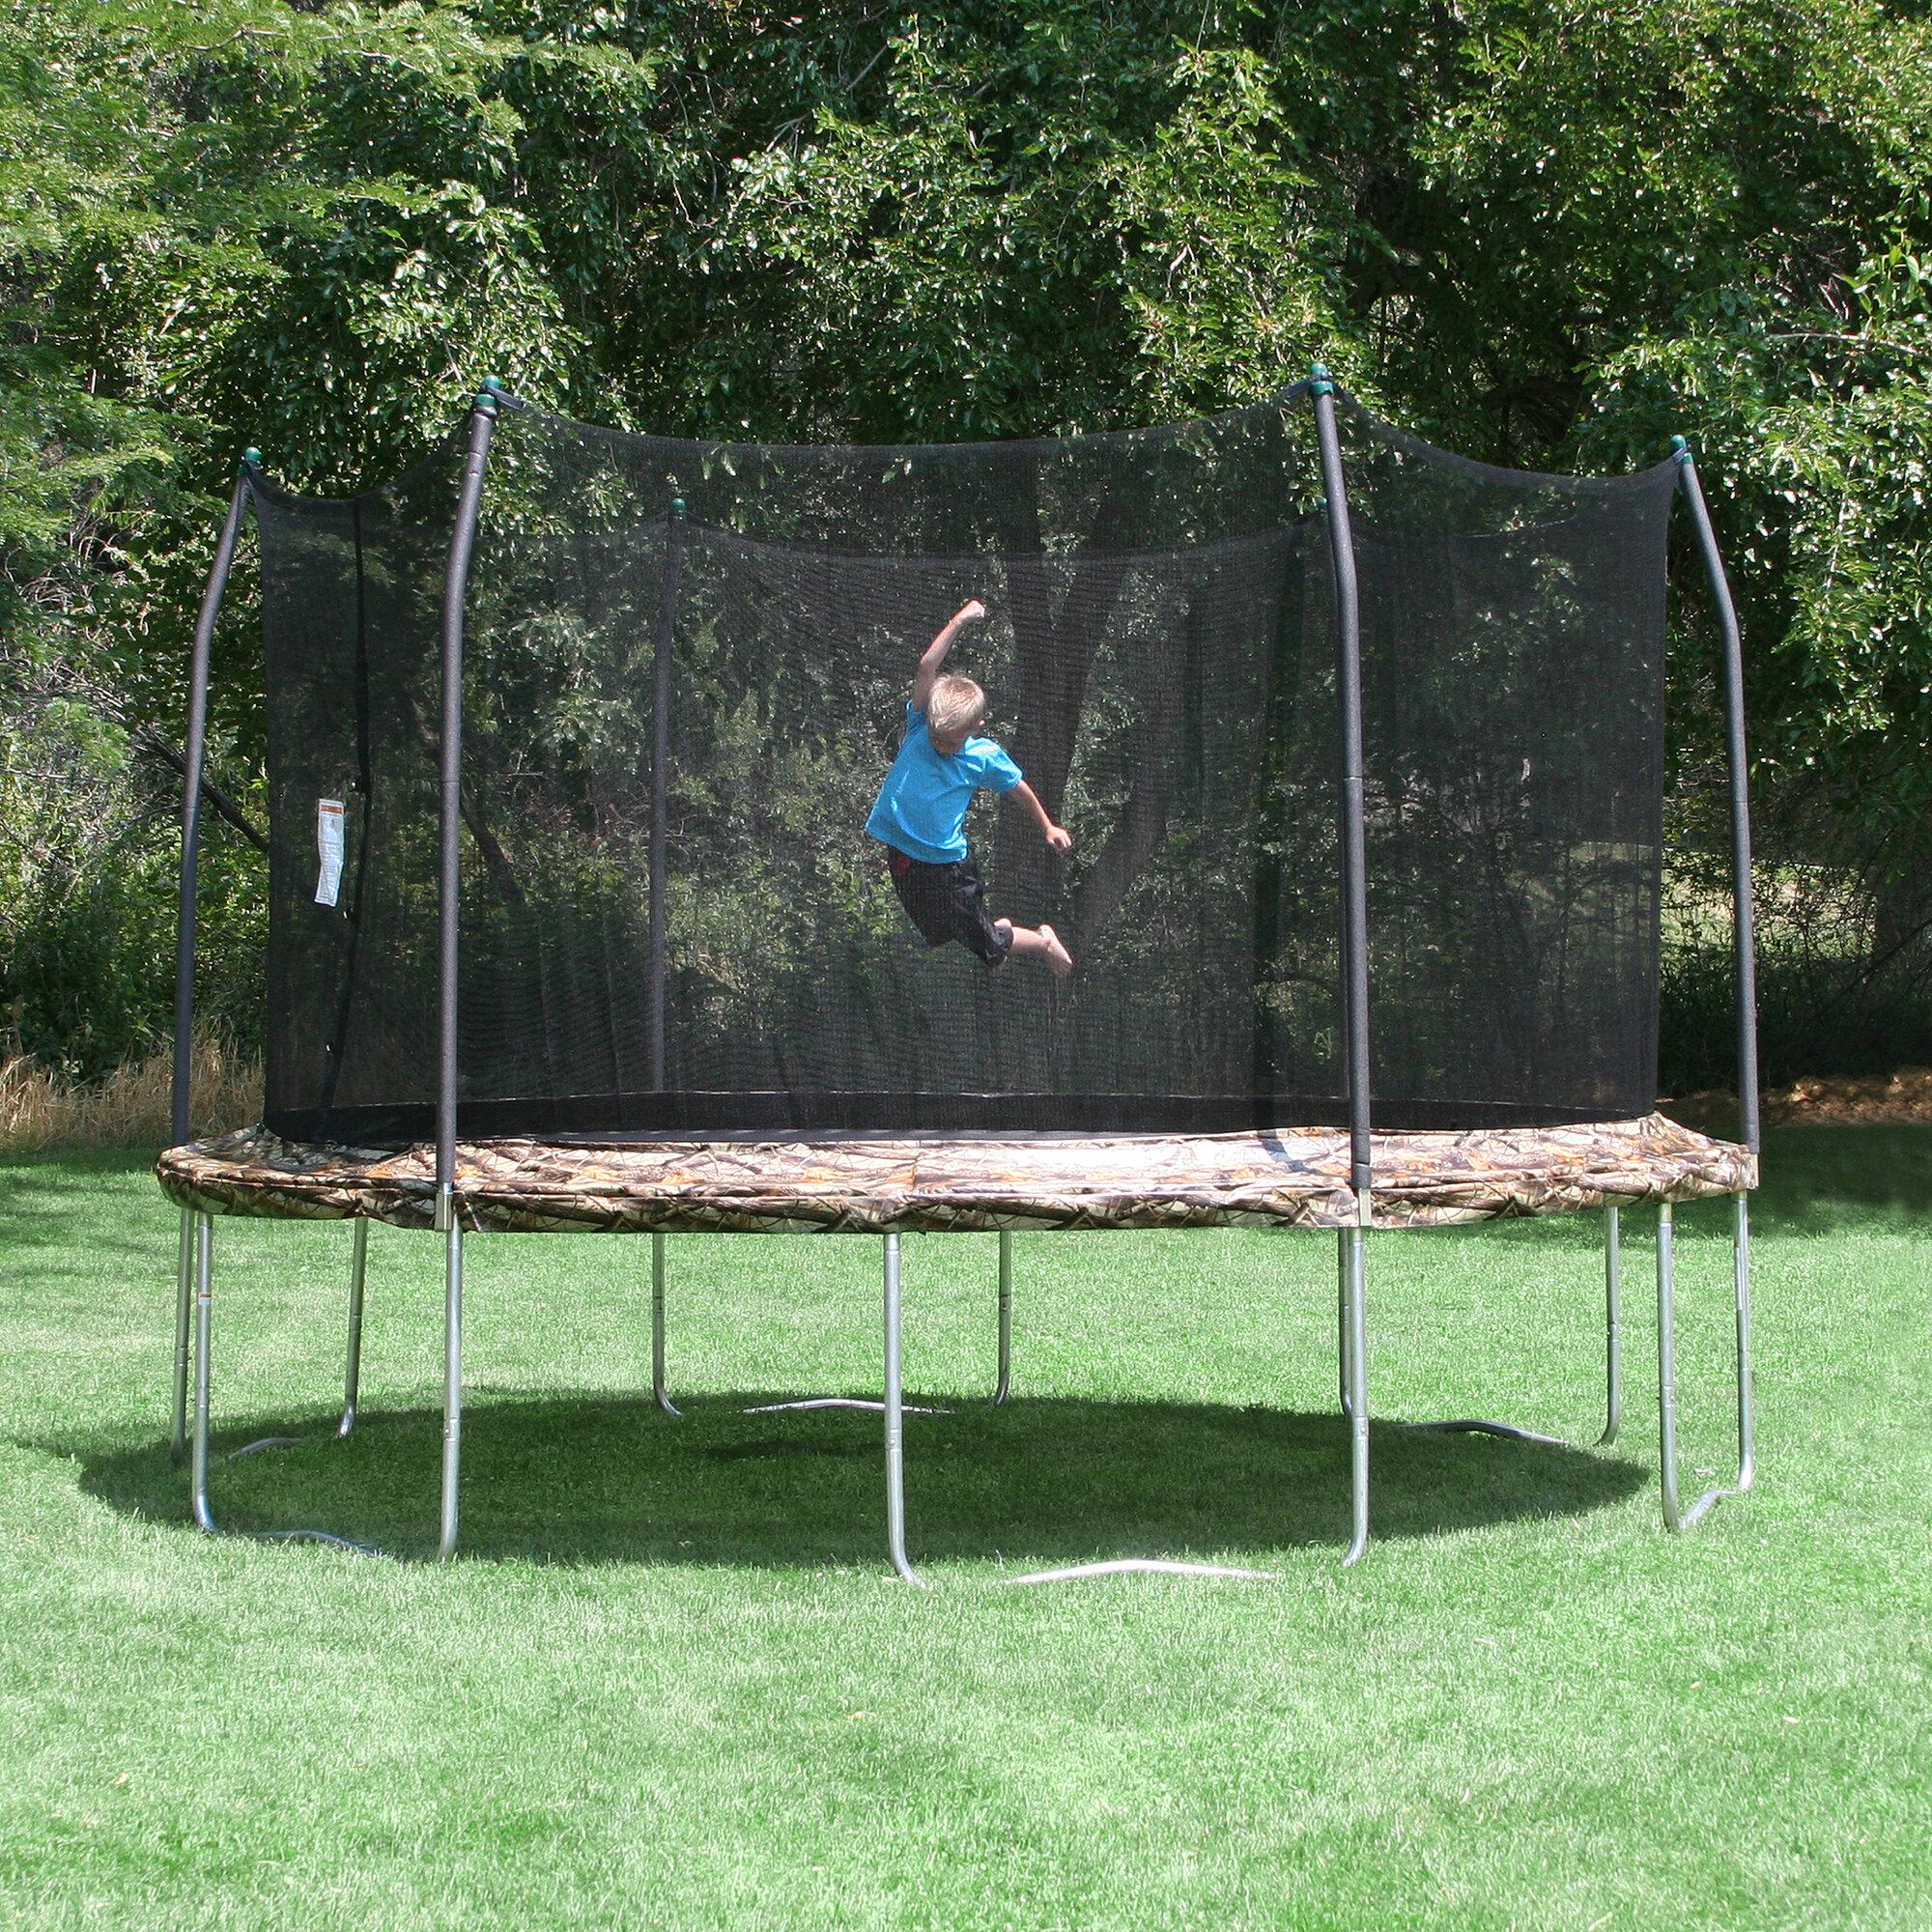 Skywalker 15 Ft Round Trampoline With Enclosure: Skywalker Trampolines Camo 15' Round Trampoline And